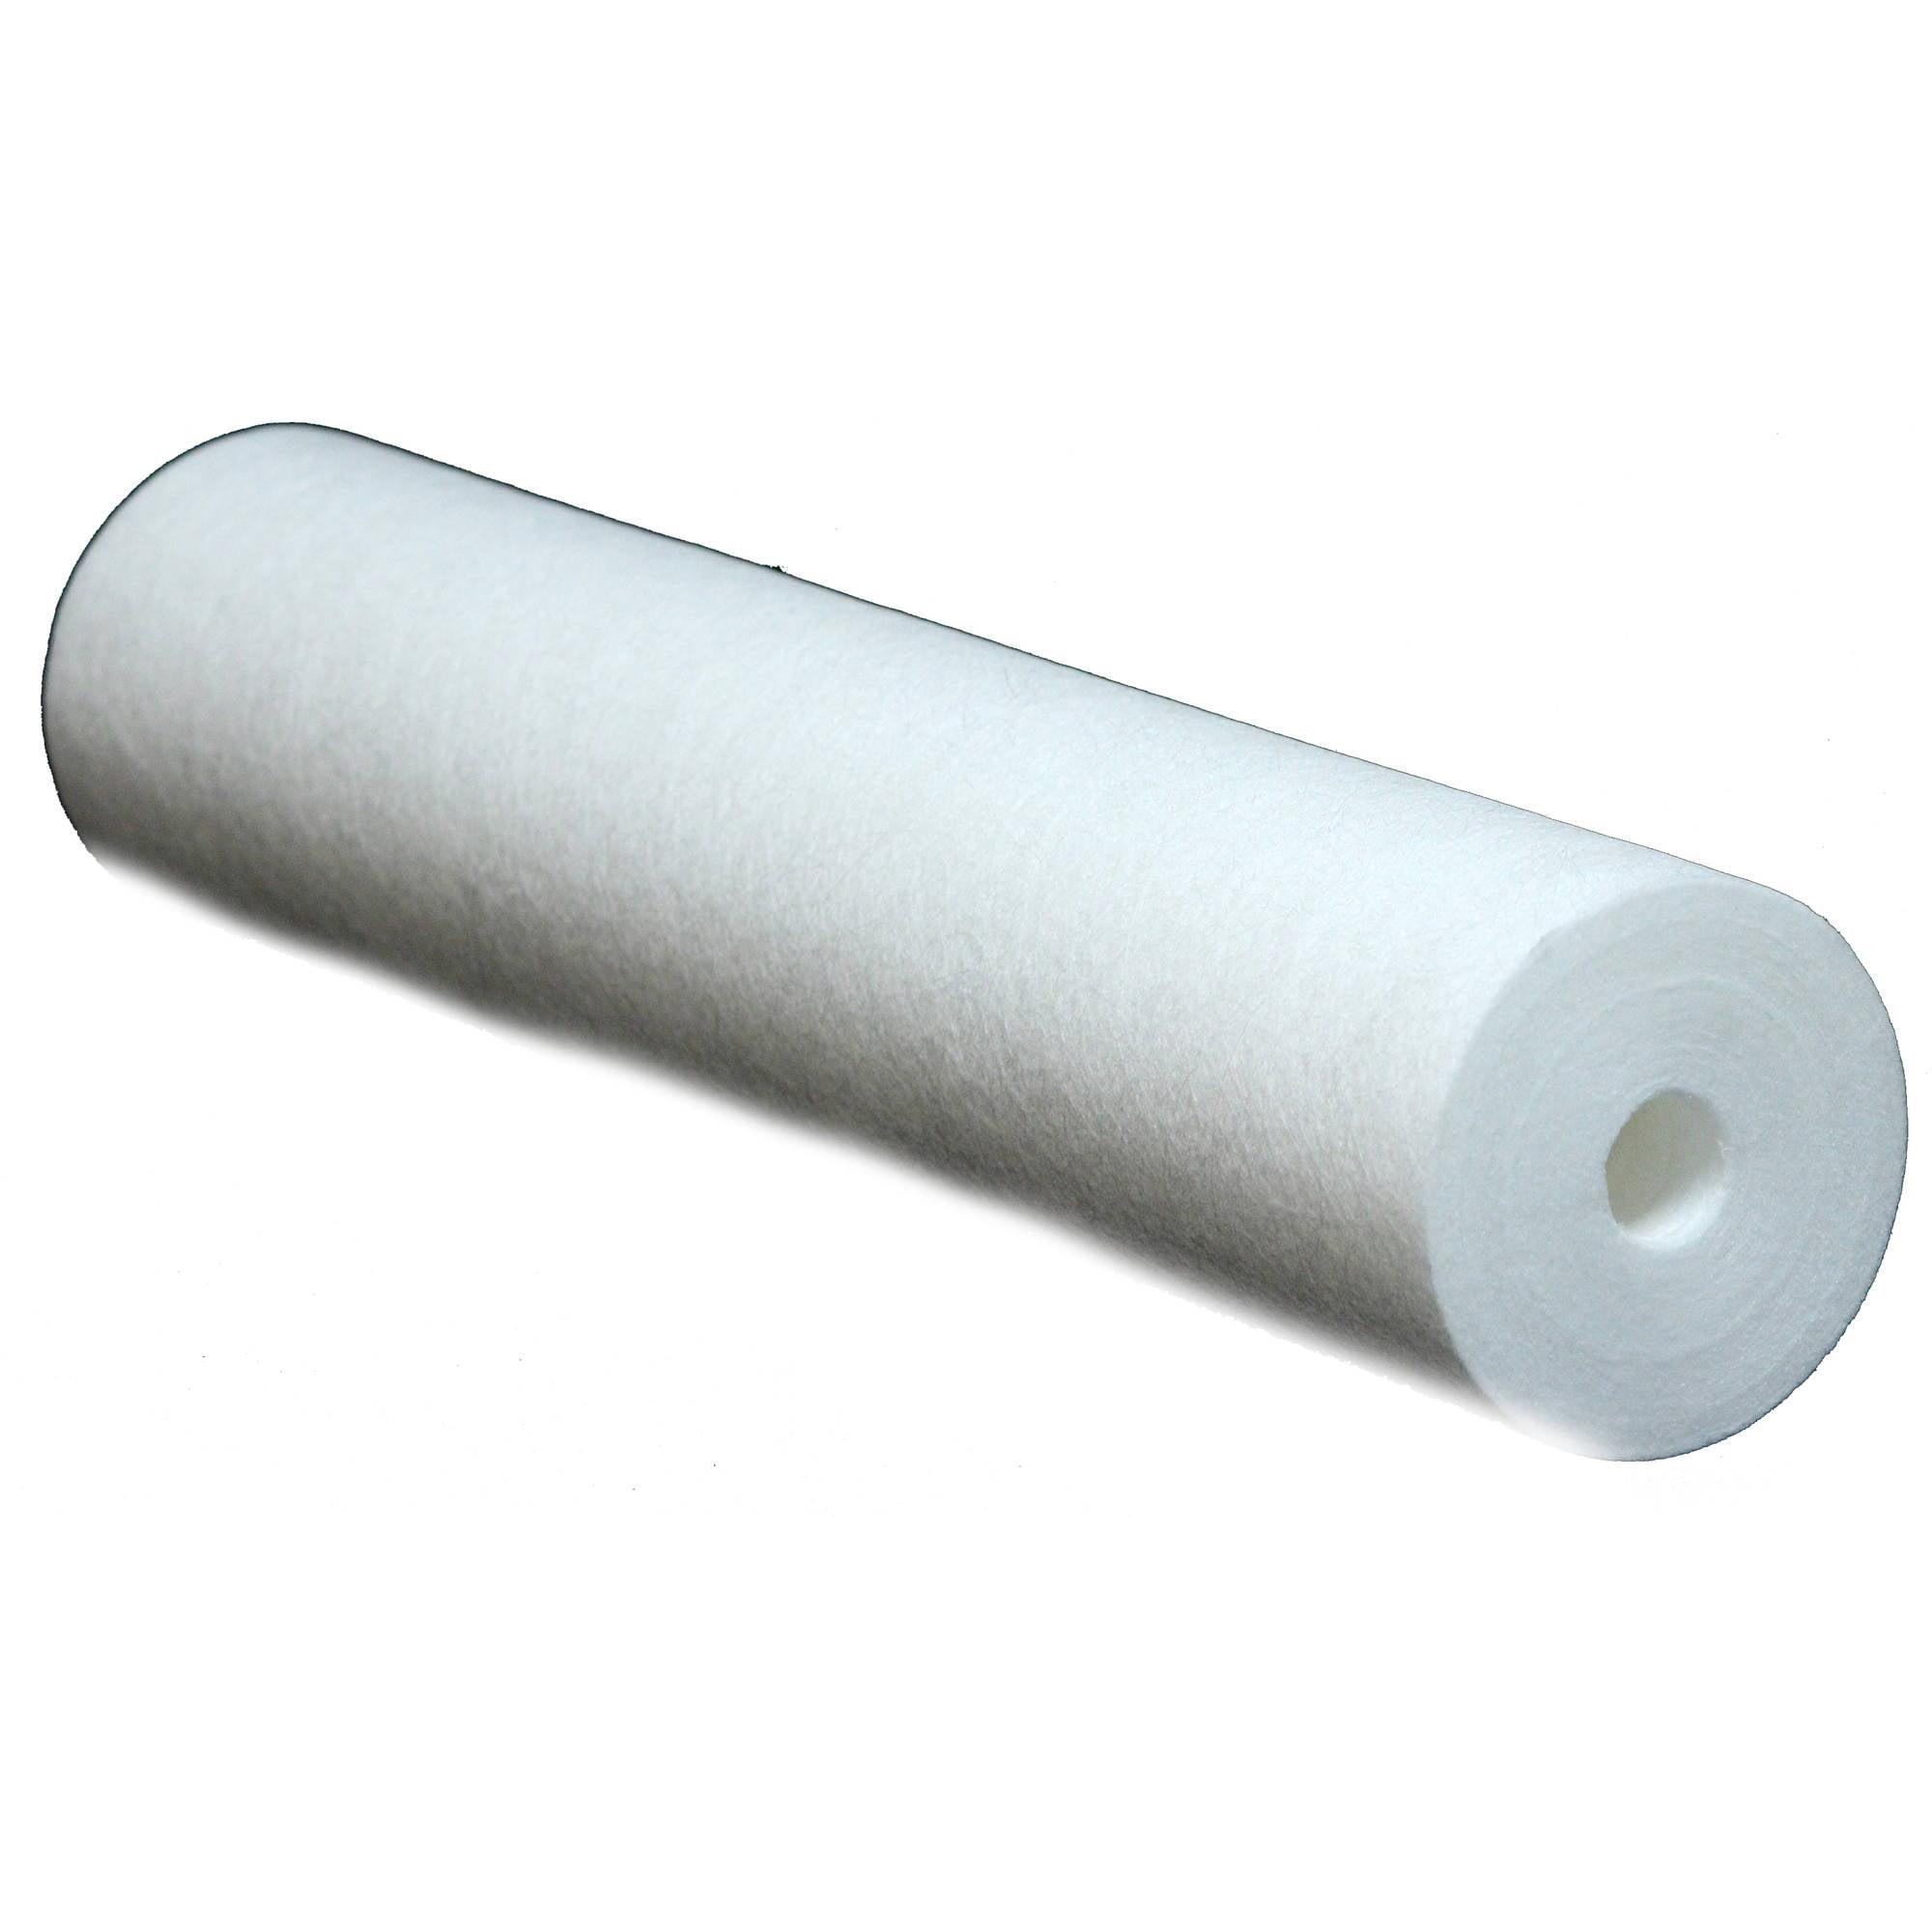 Vitapur VS20RF-PP sediment replacement filter for UV system VPS1140-1